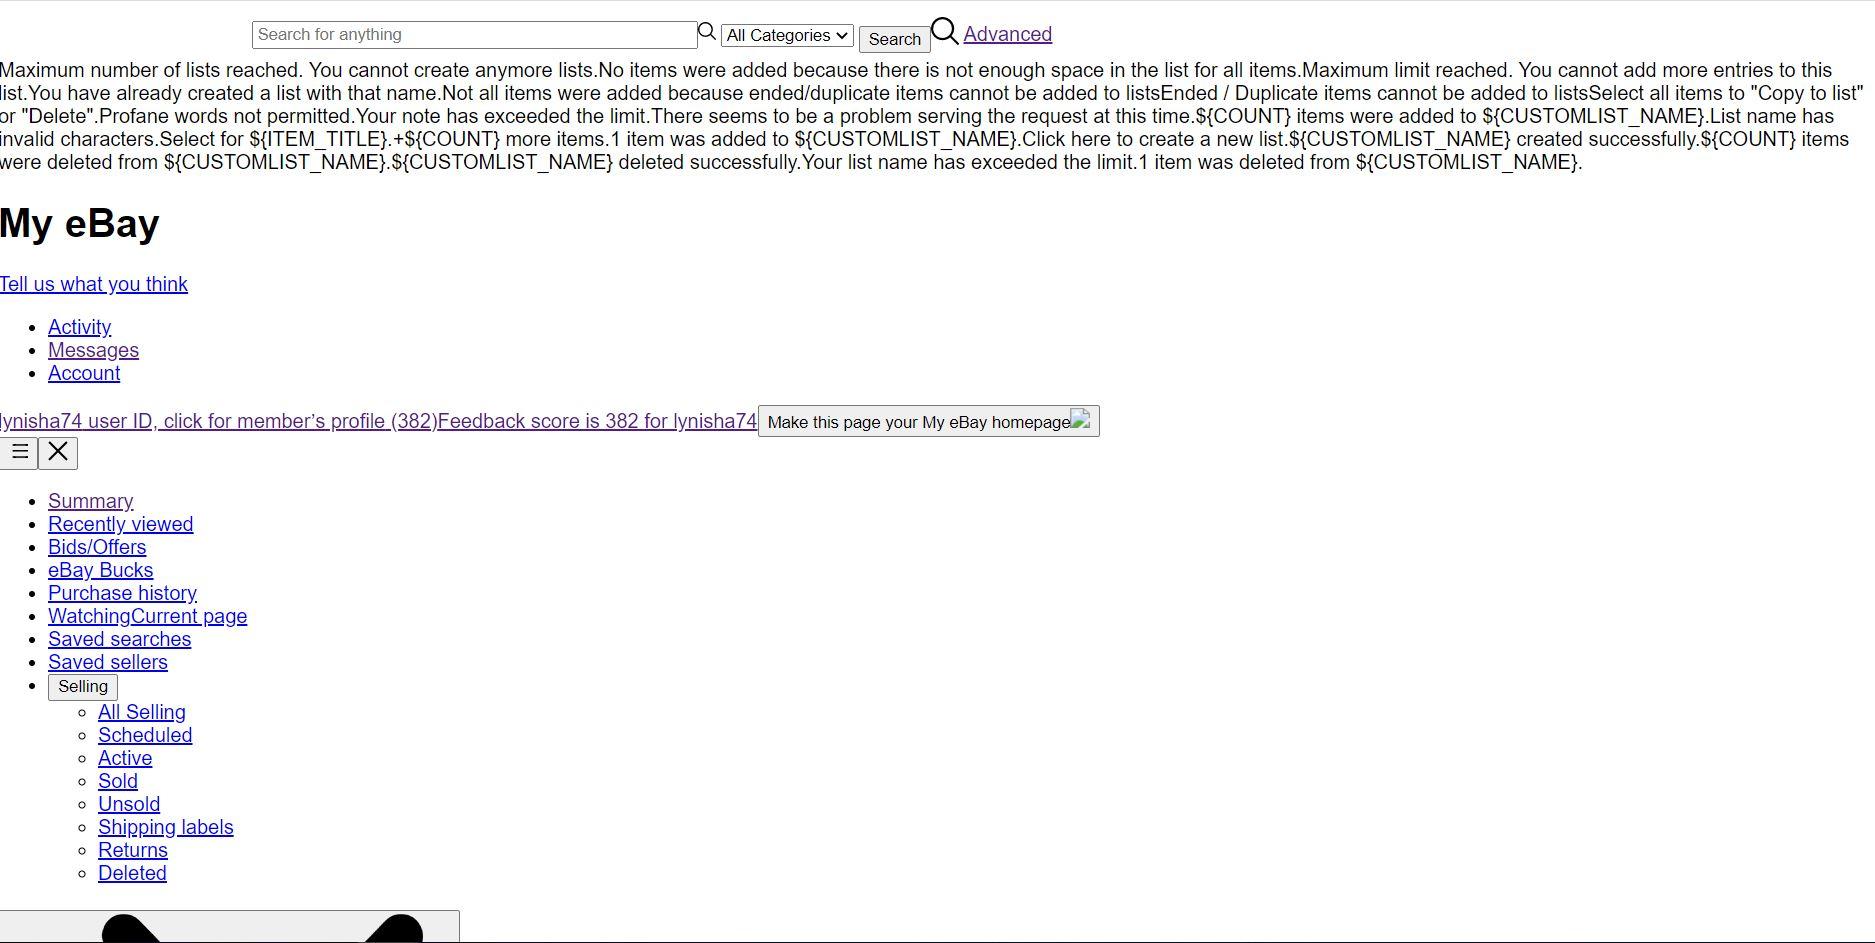 Ebay Pages Not Loading Properly The Ebay Community